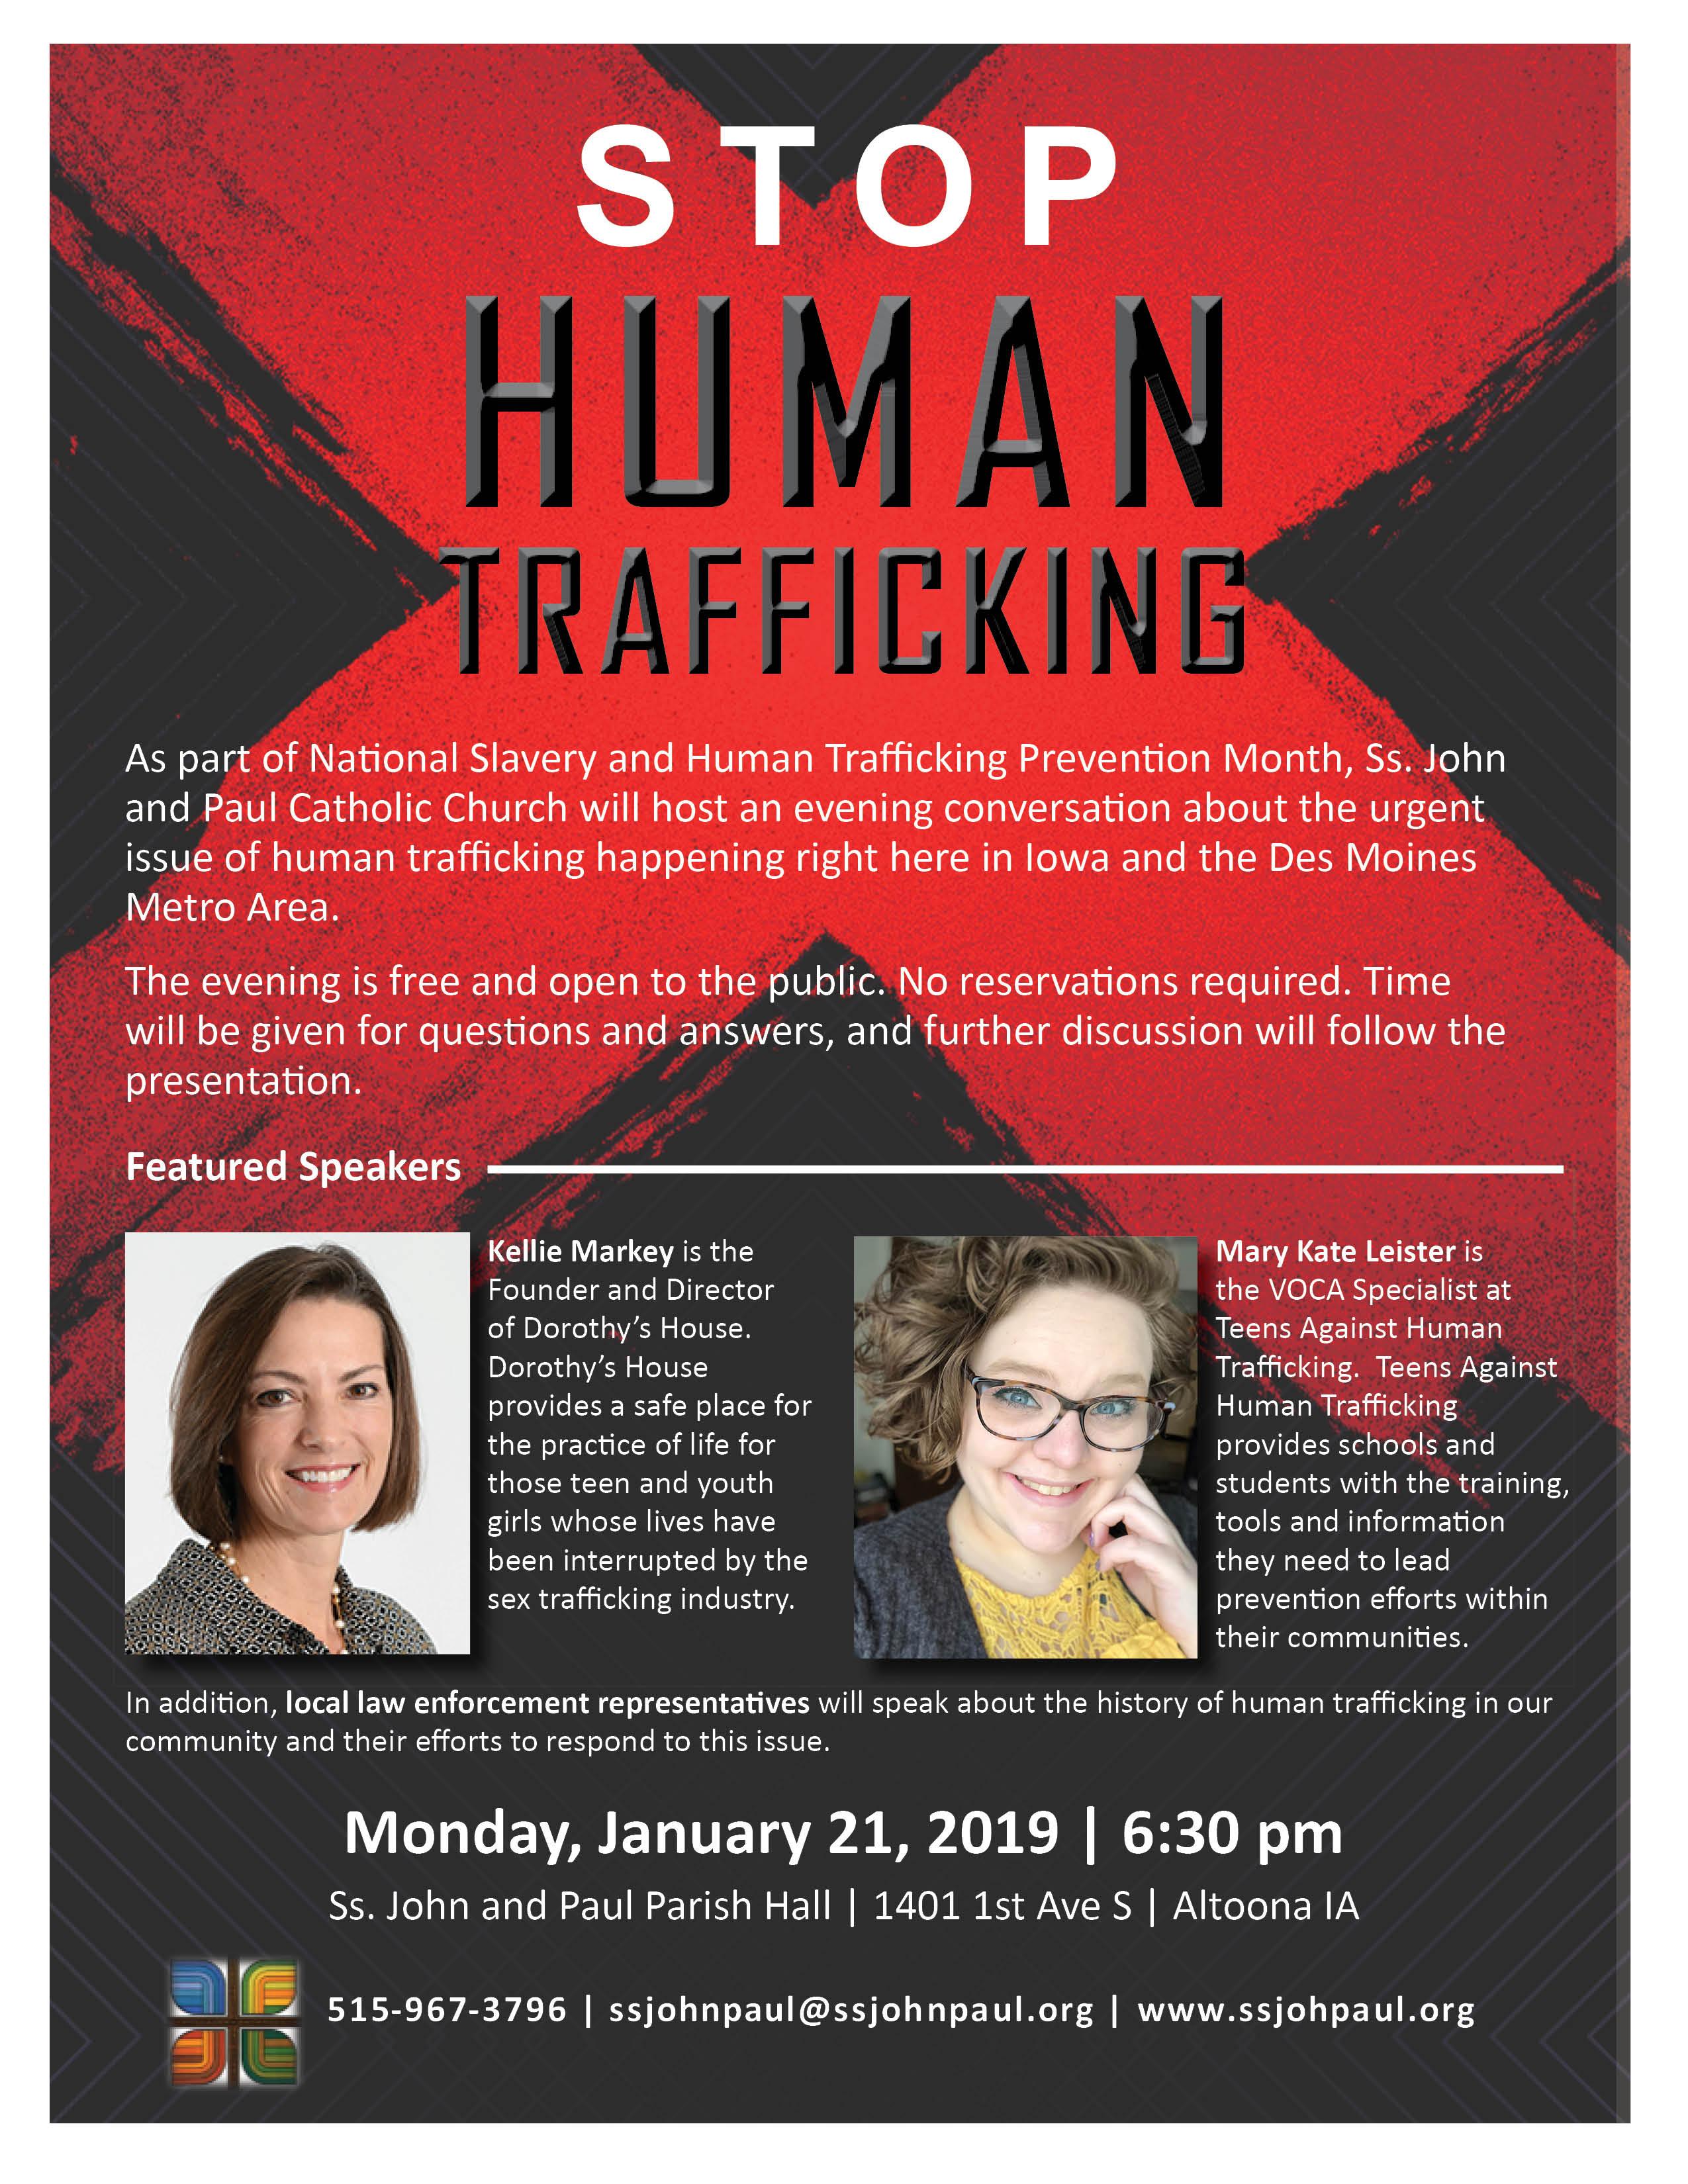 Iowa's Human Trafficking Problem Presentation/Discussion